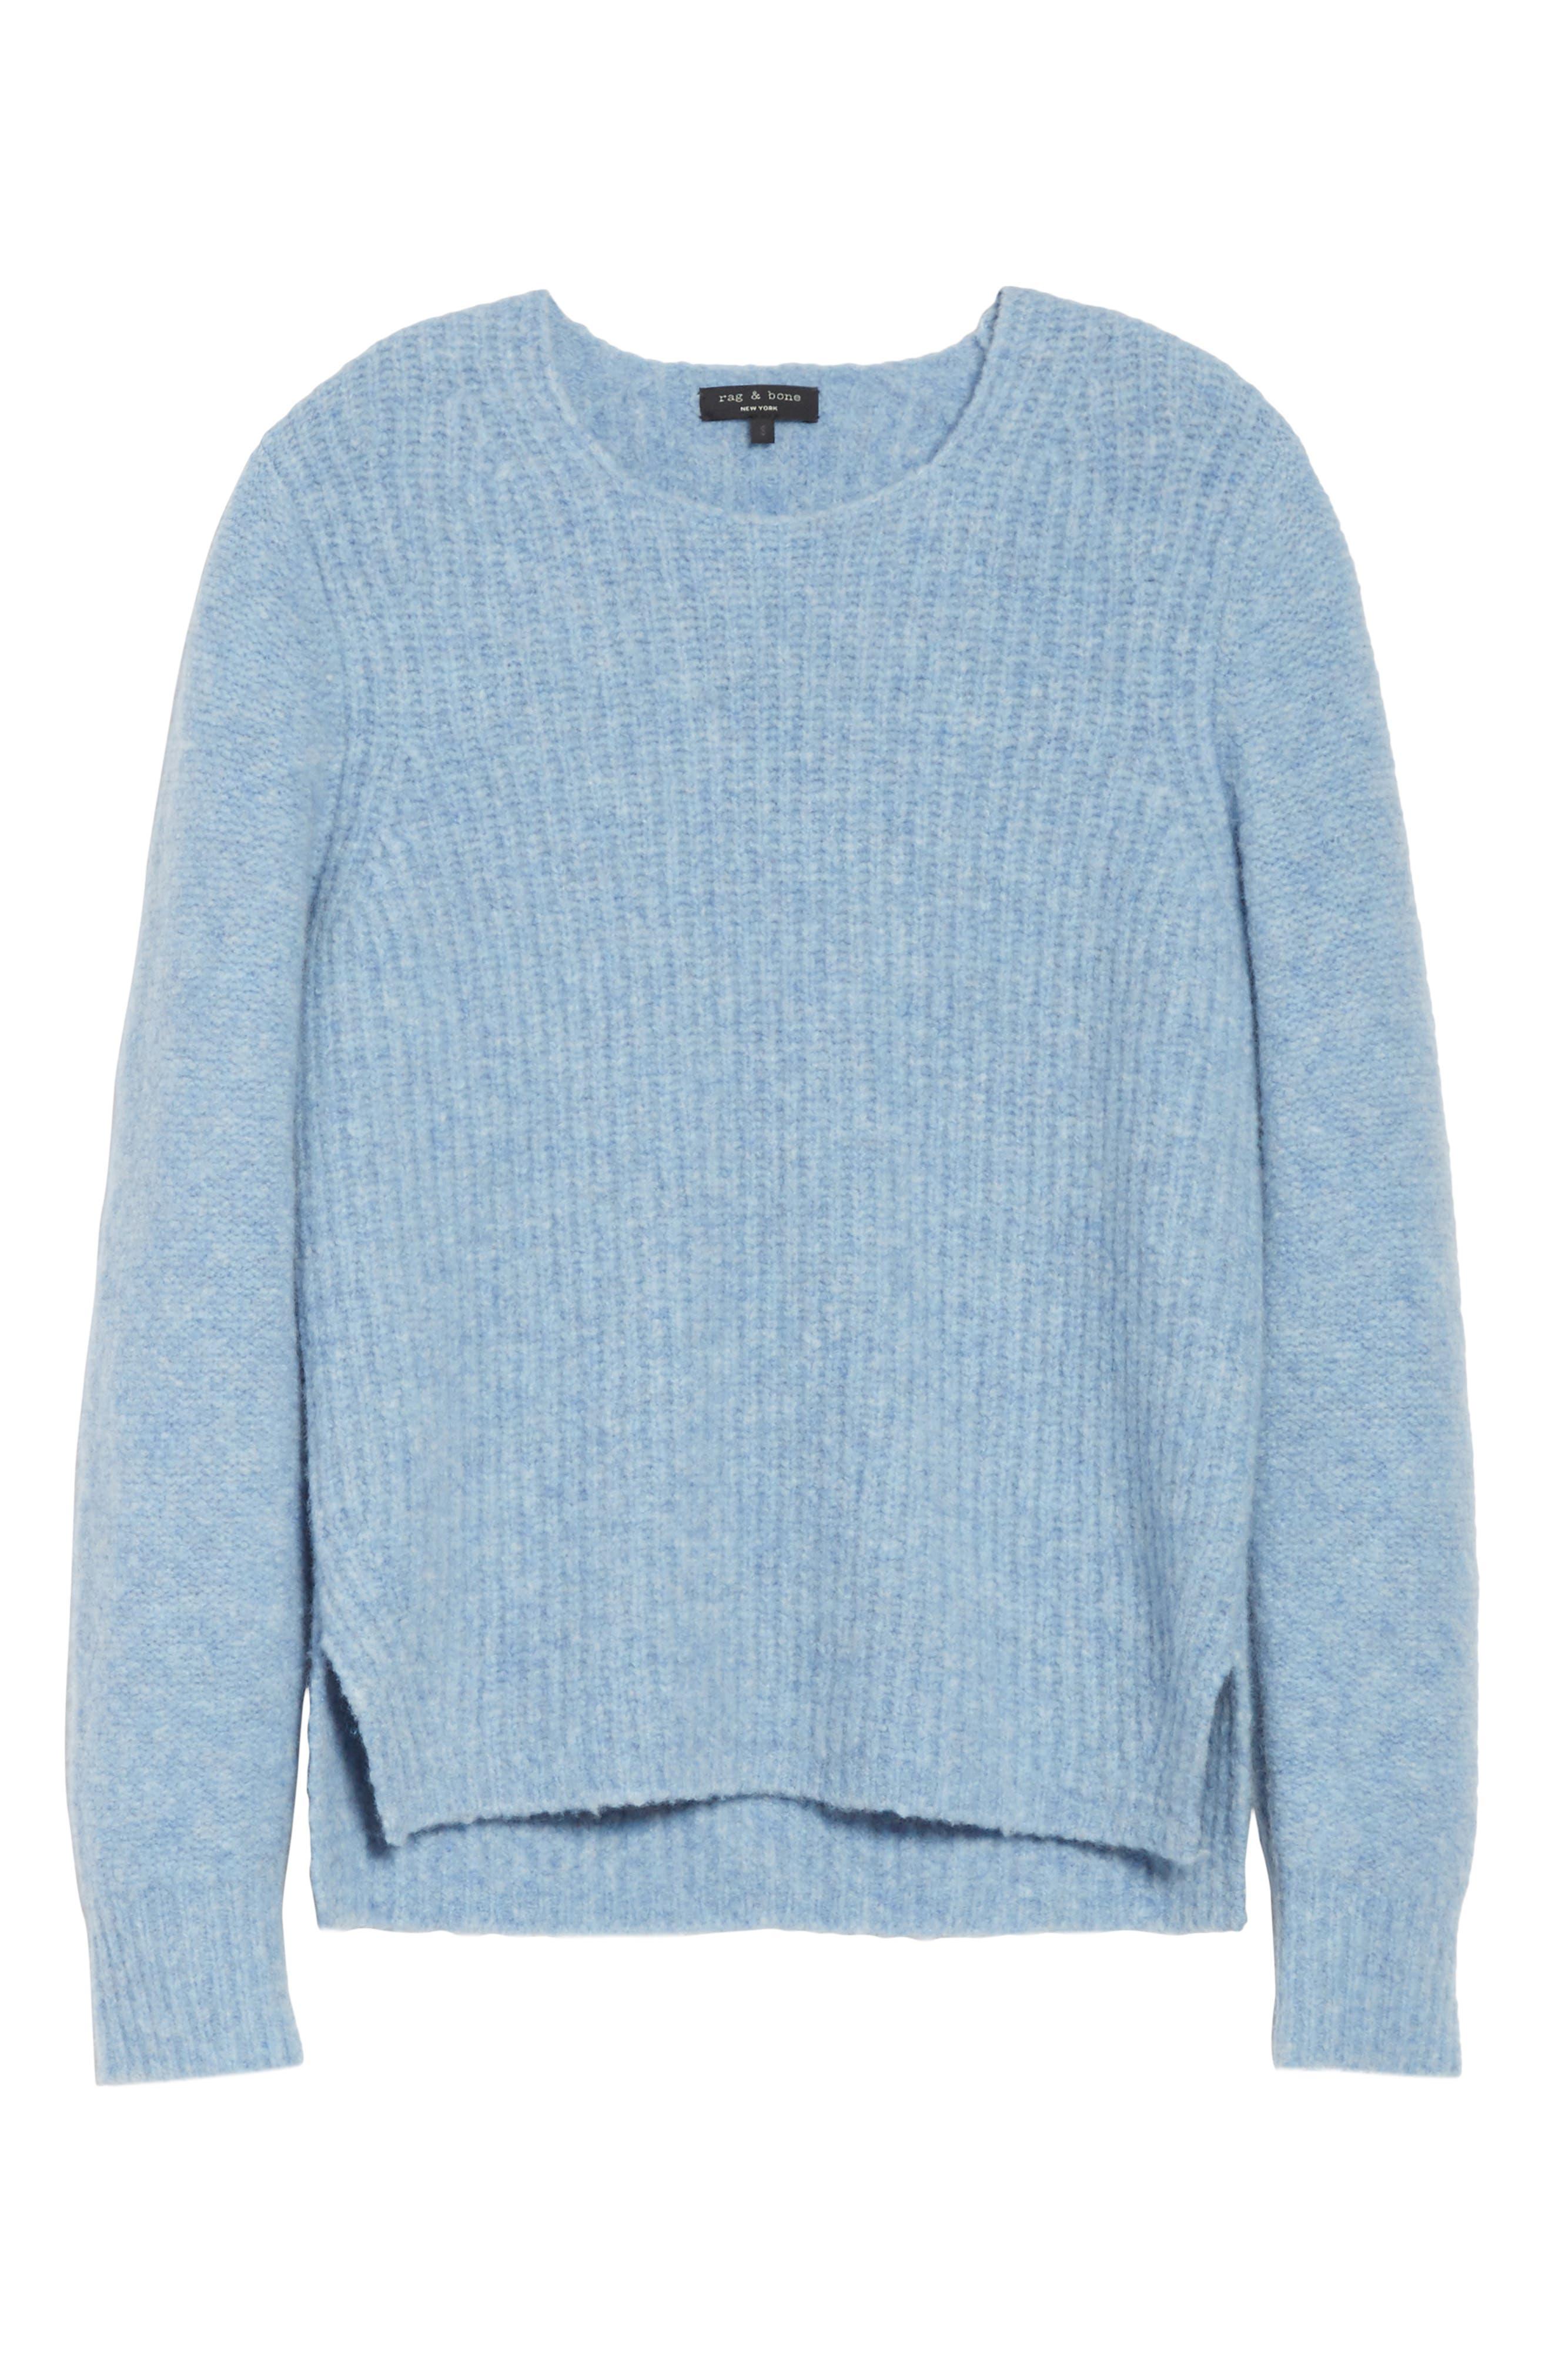 Francie Merino Wool Blend Sweater,                             Alternate thumbnail 6, color,                             Light Blue